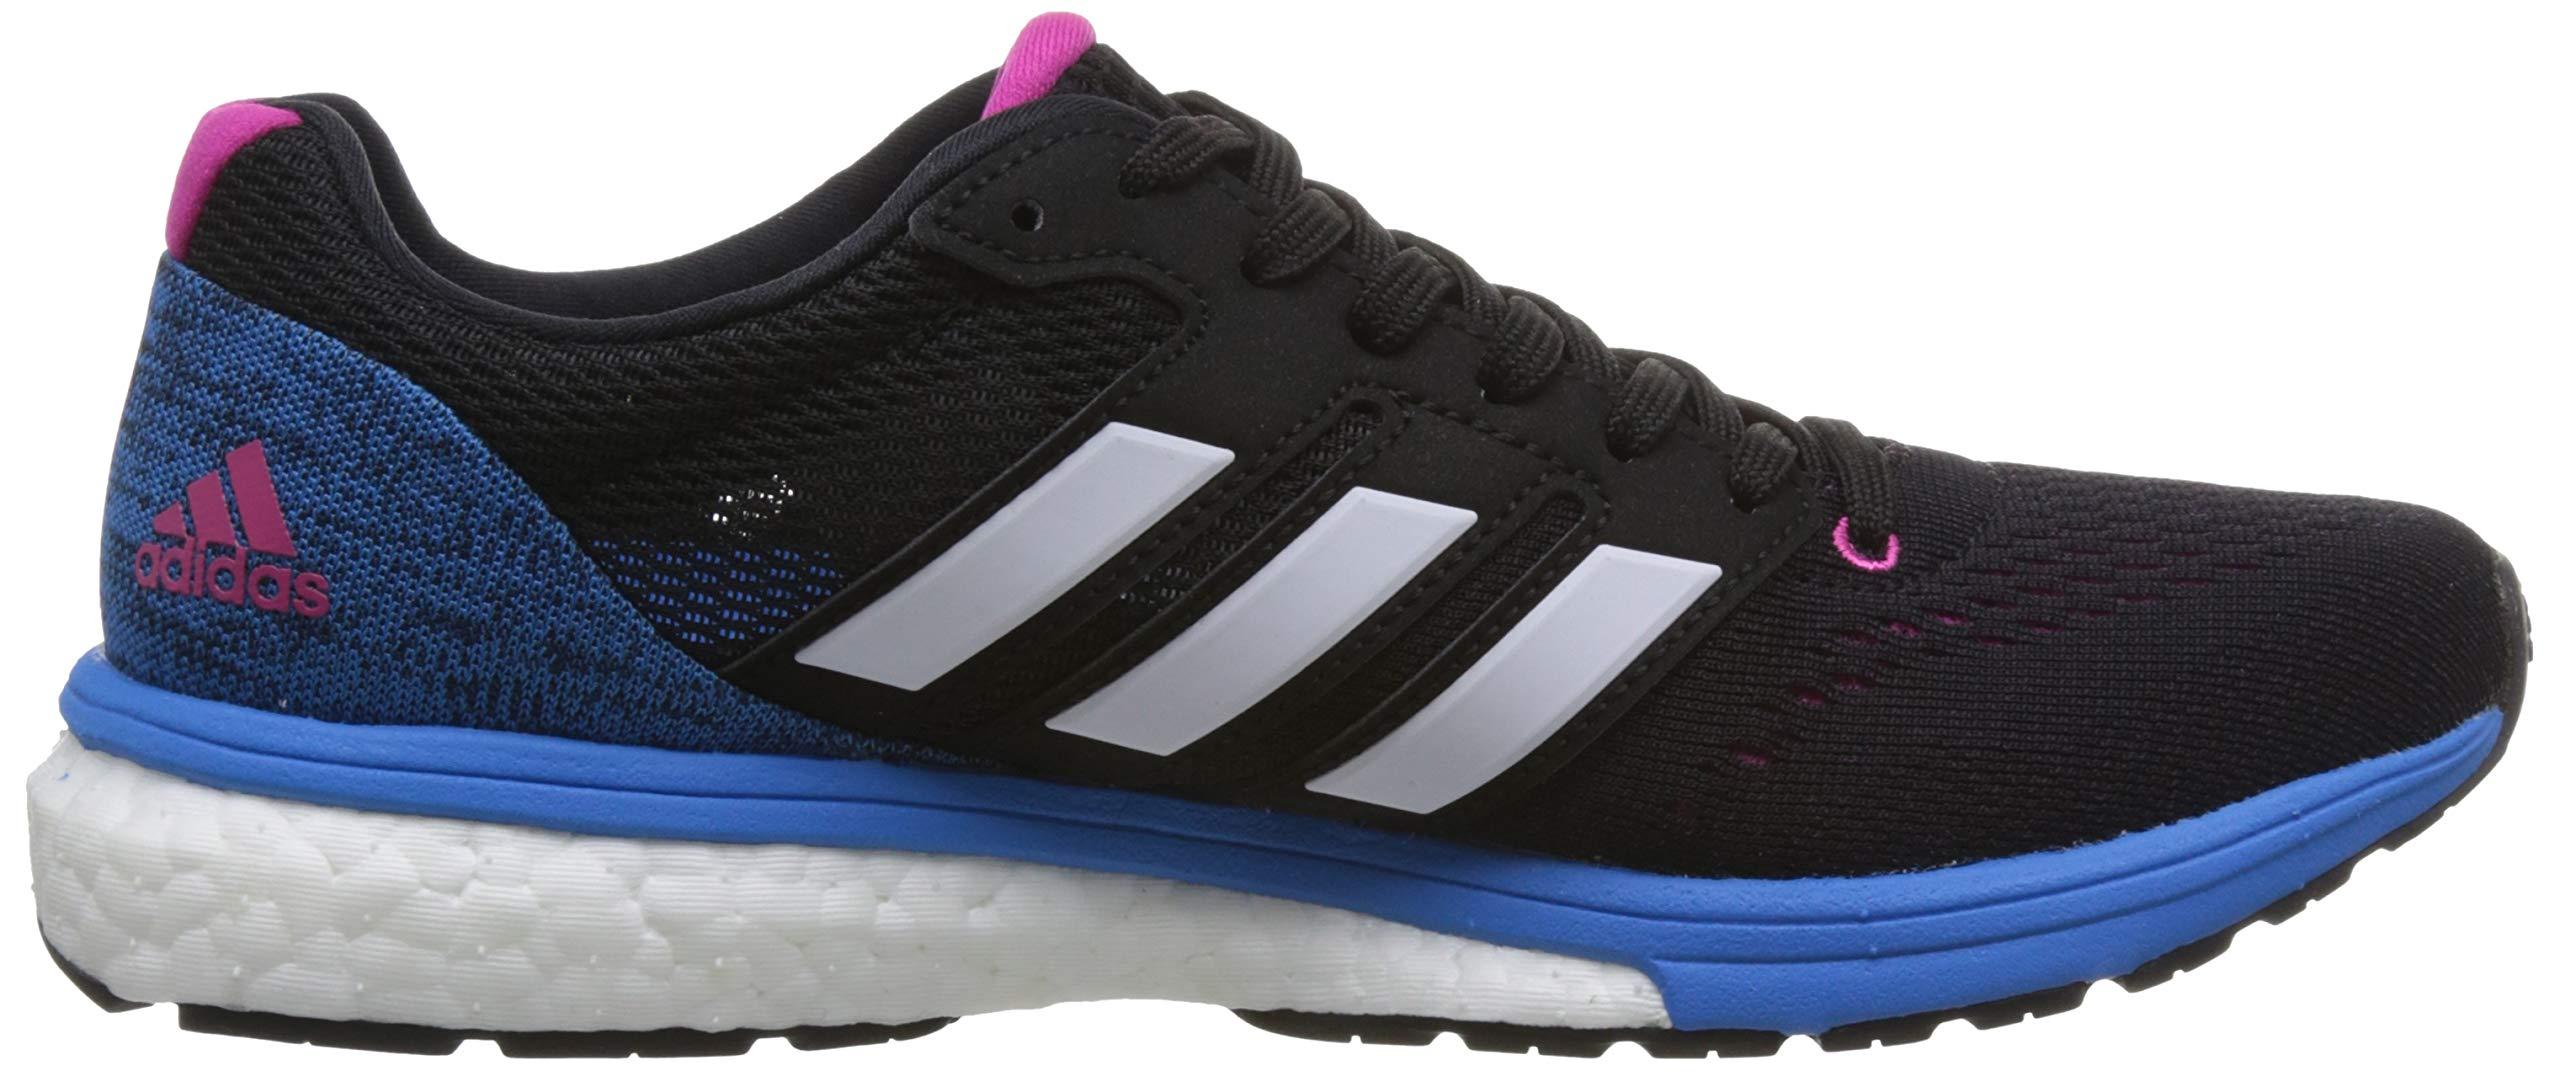 71UhUpImdPL - adidas Women's Adizero Boston 7 W Running Shoes